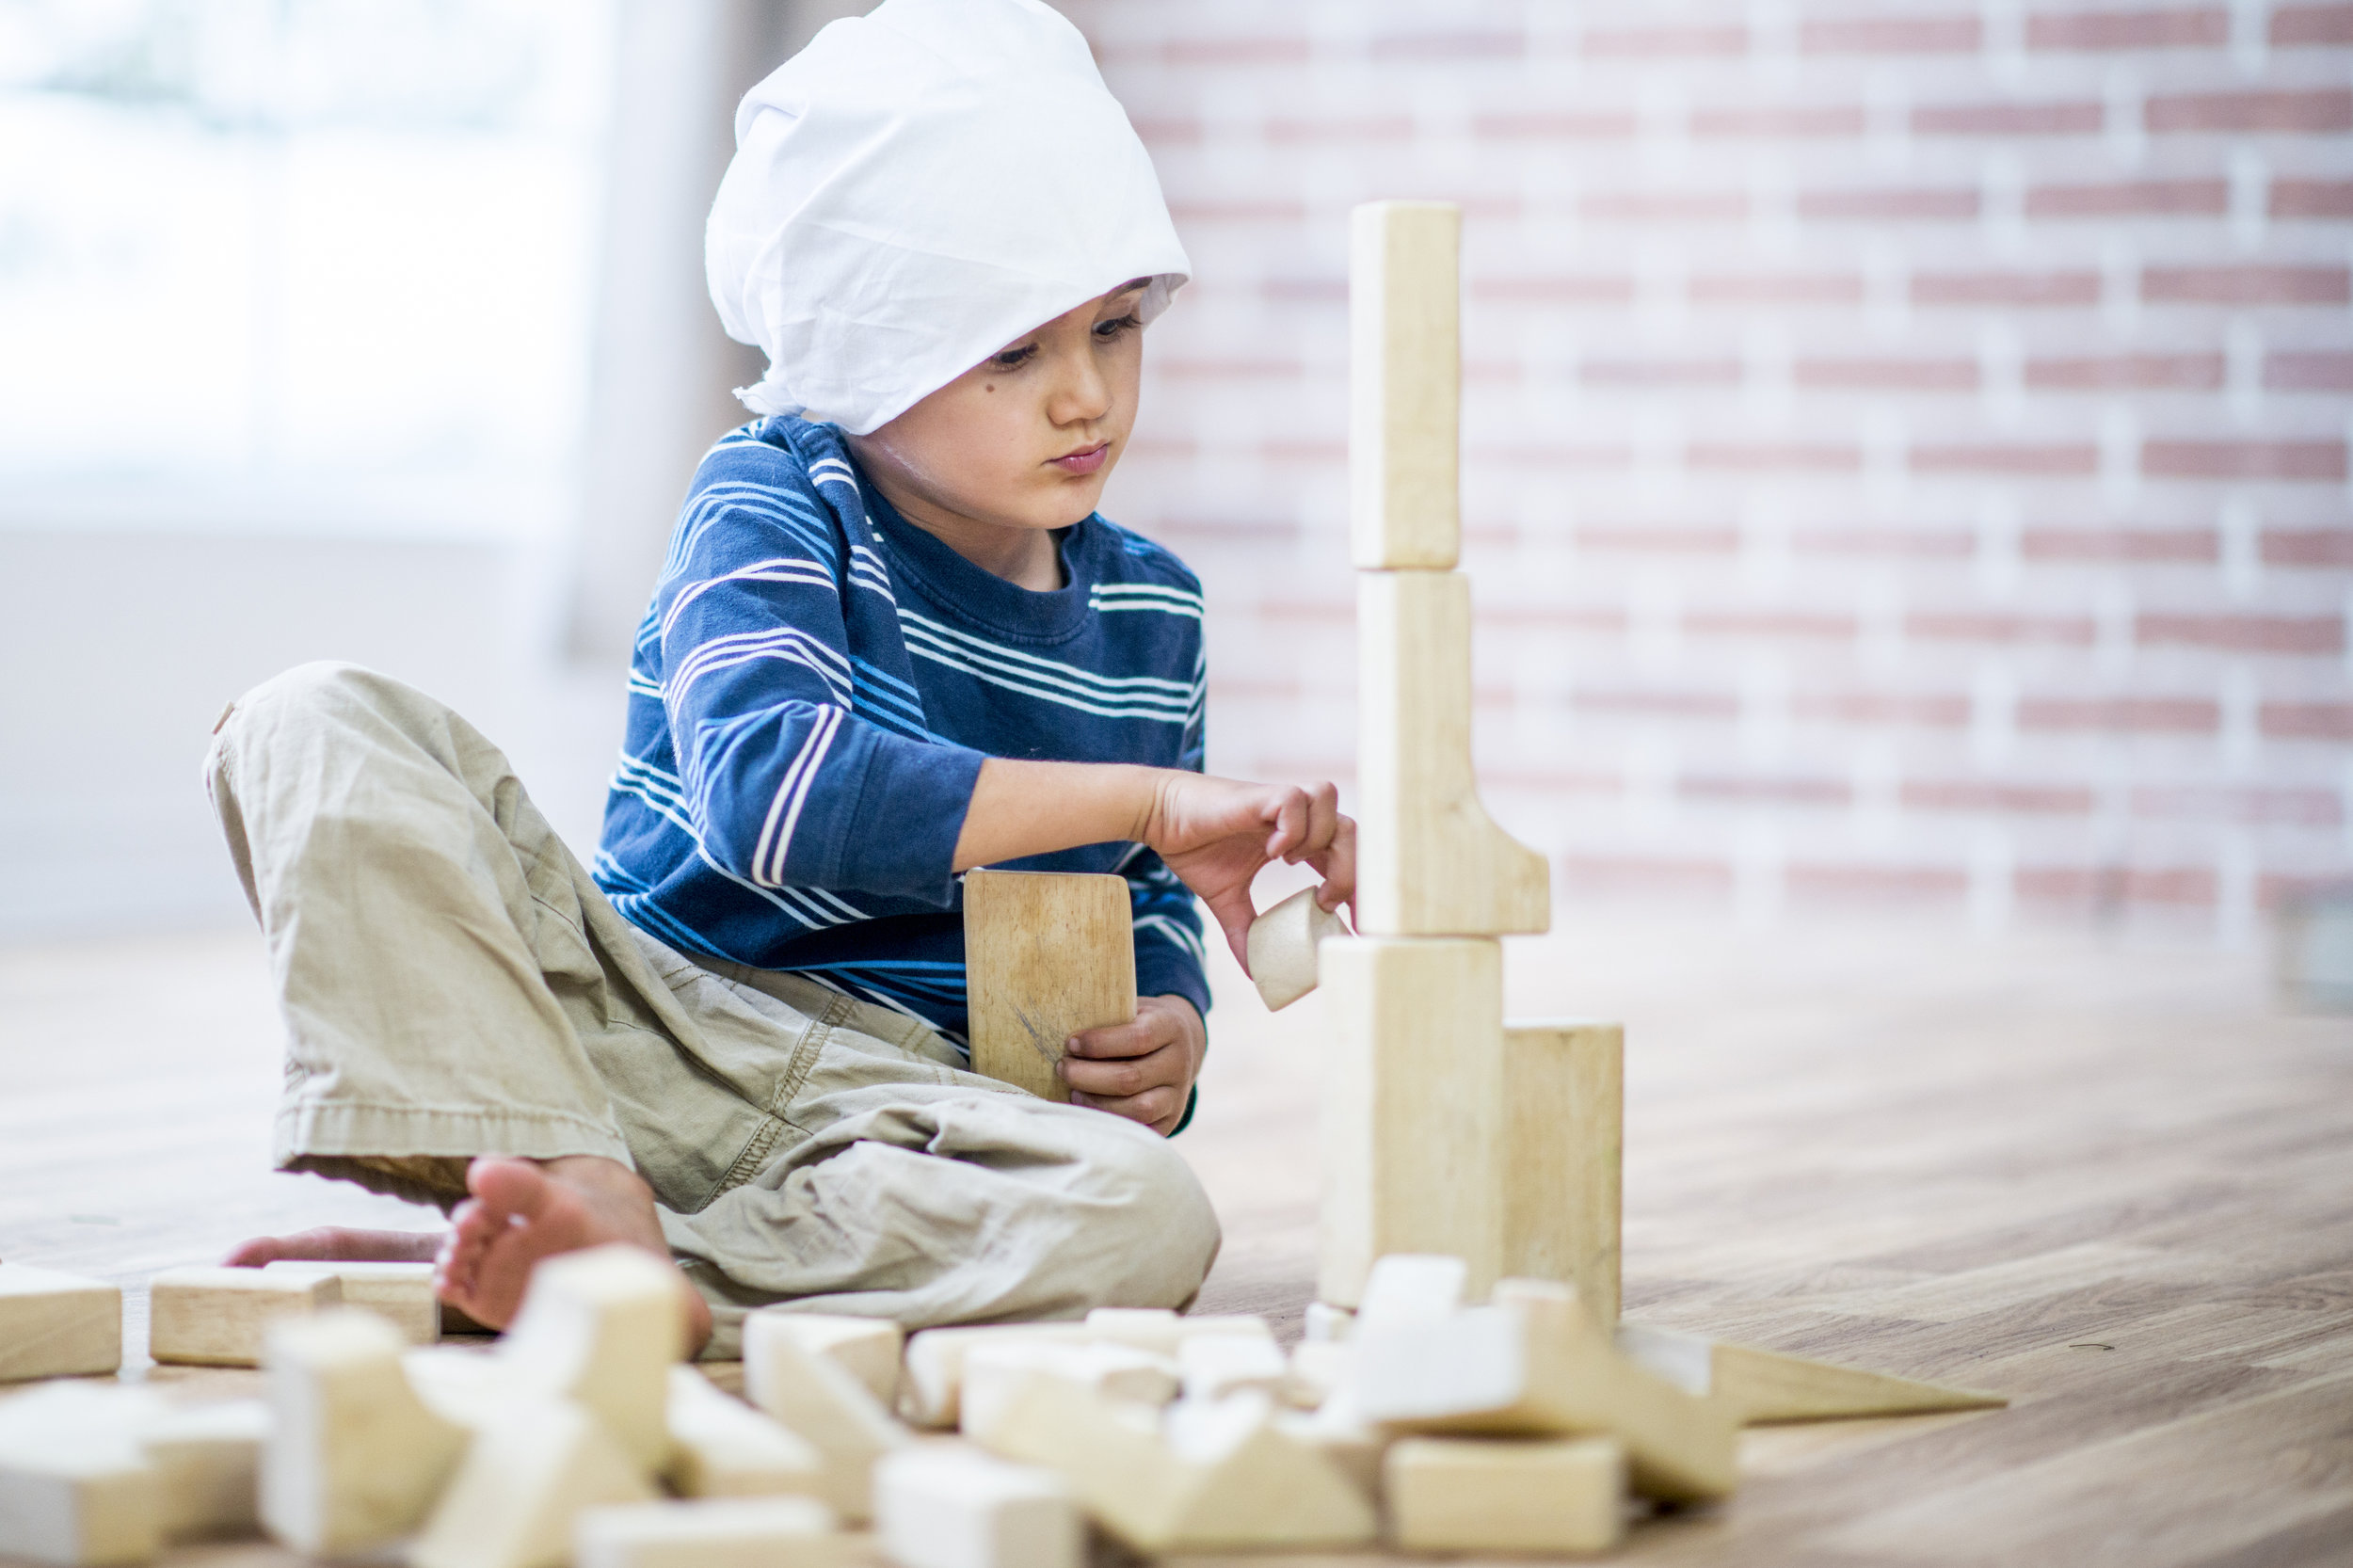 aPODD foundation Child Building Blocks.jpg